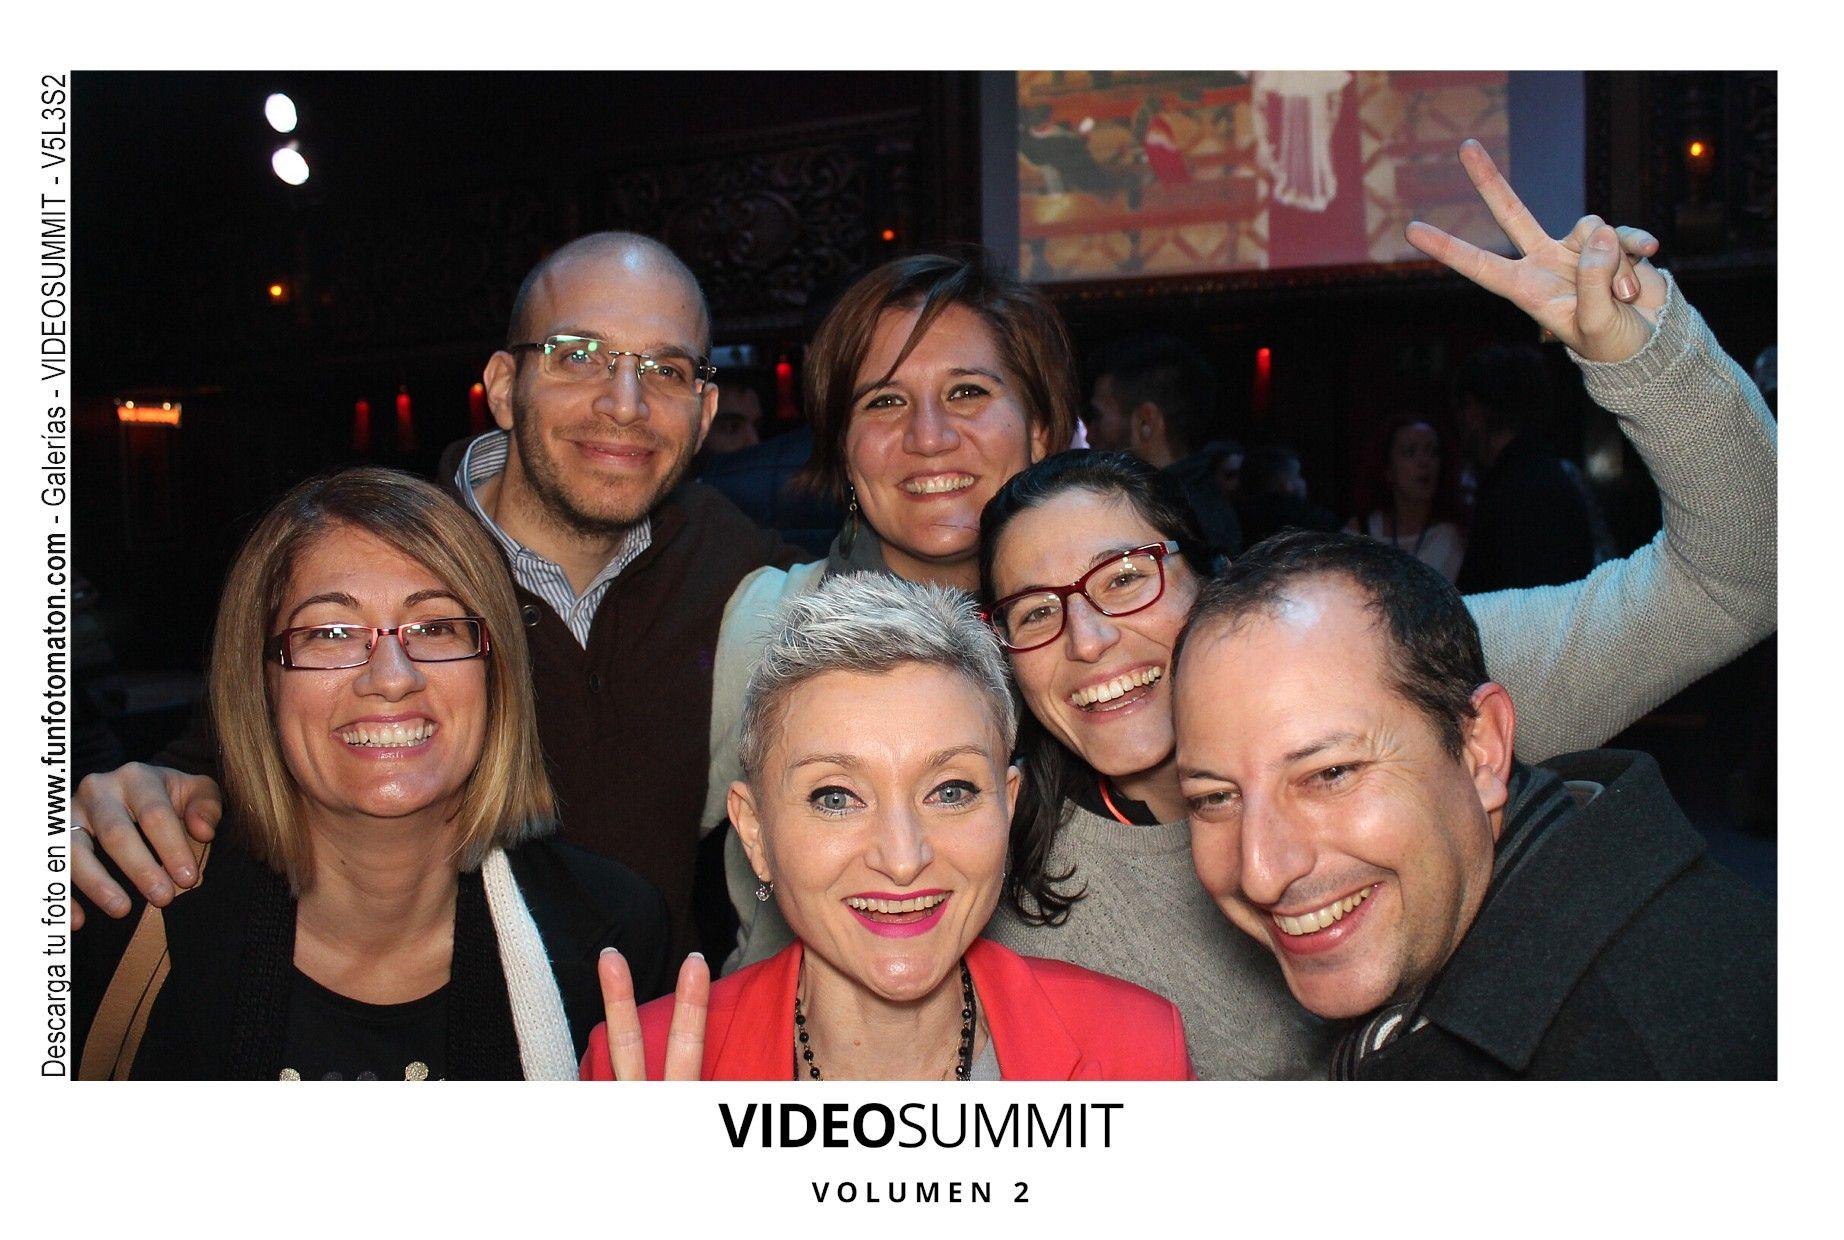 videosummit-vol2-club-party-047